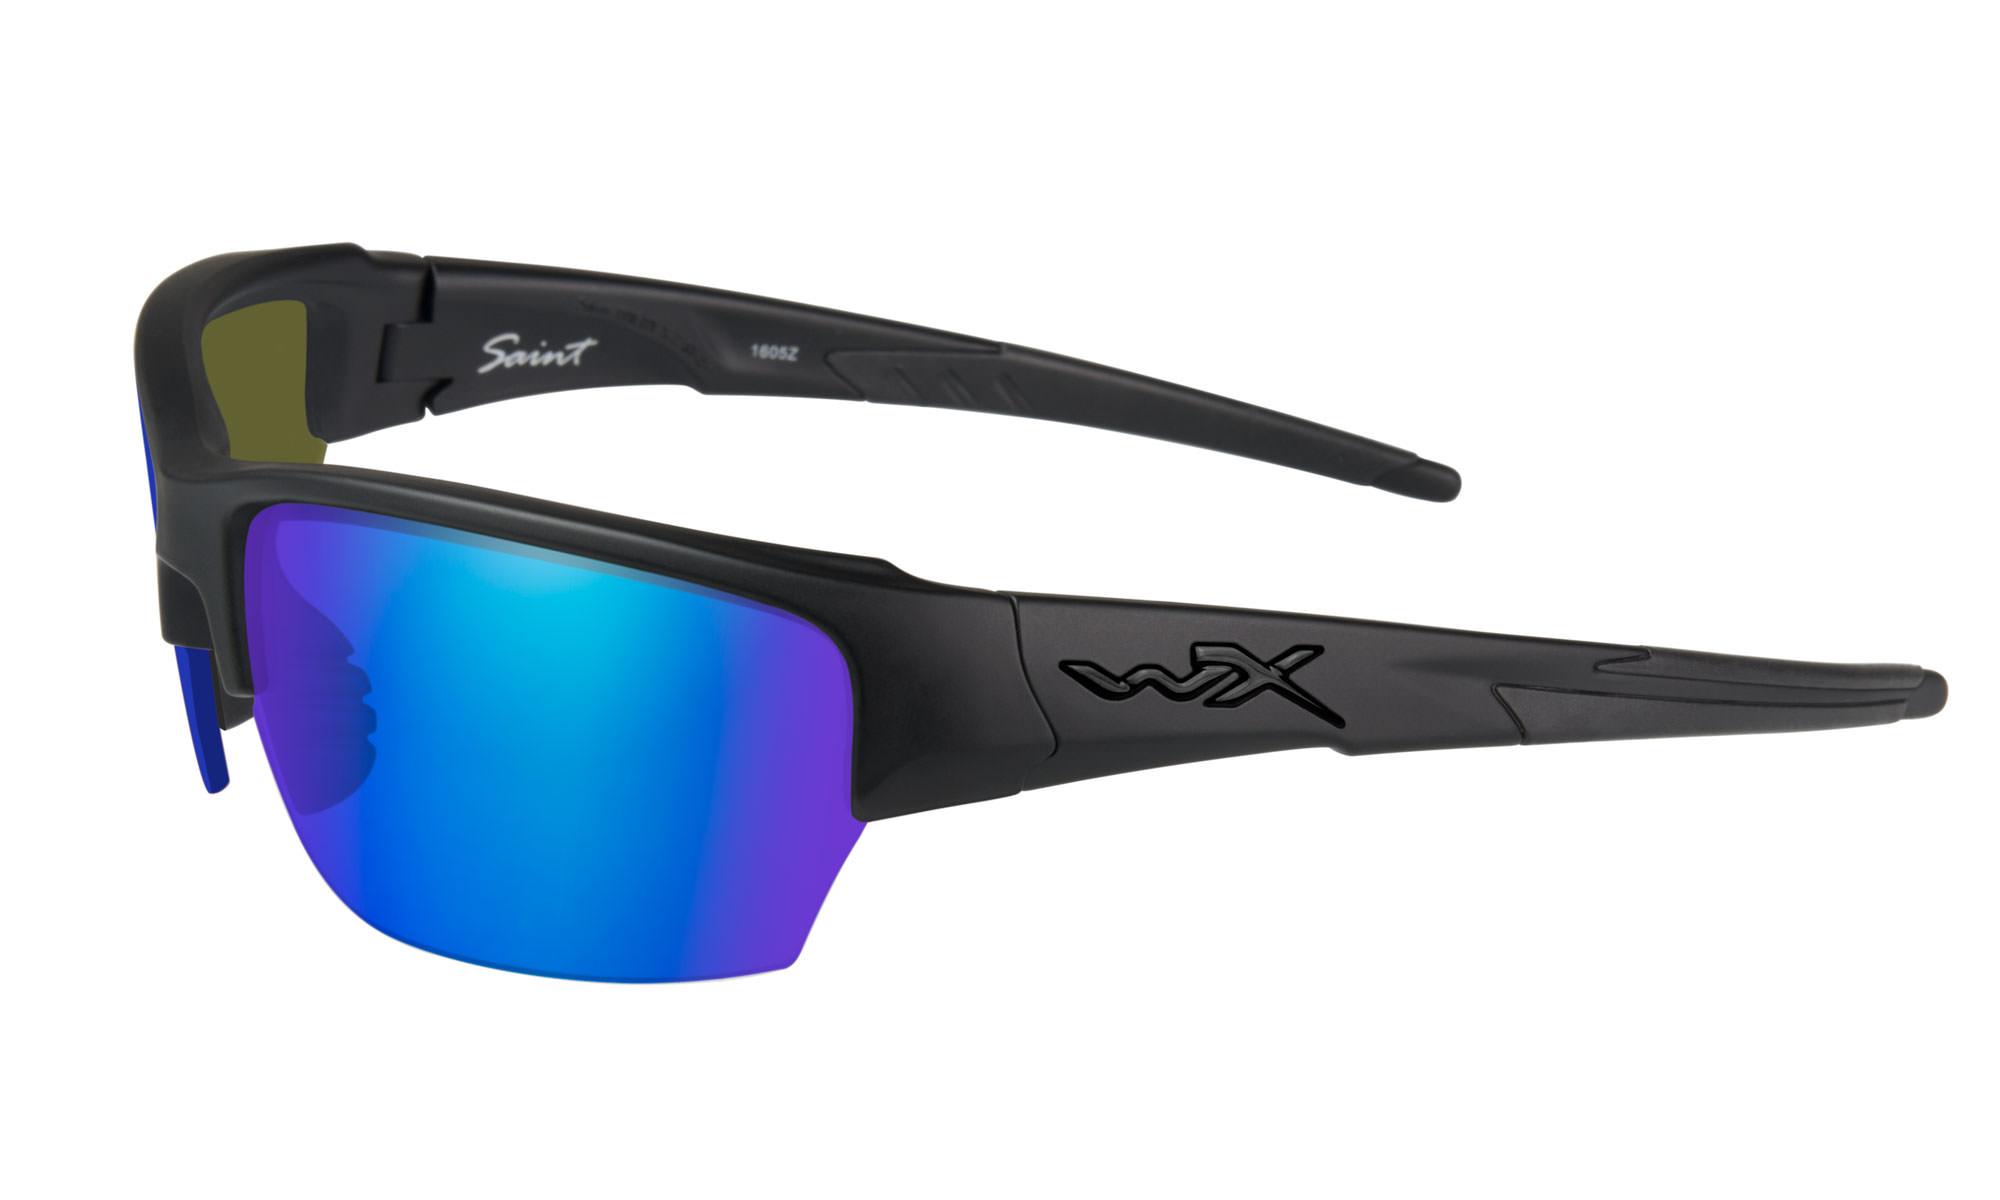 86bc66ad553ca Wiley-X WX Saint Matte Black with Polarized Blue Mirror Lenses